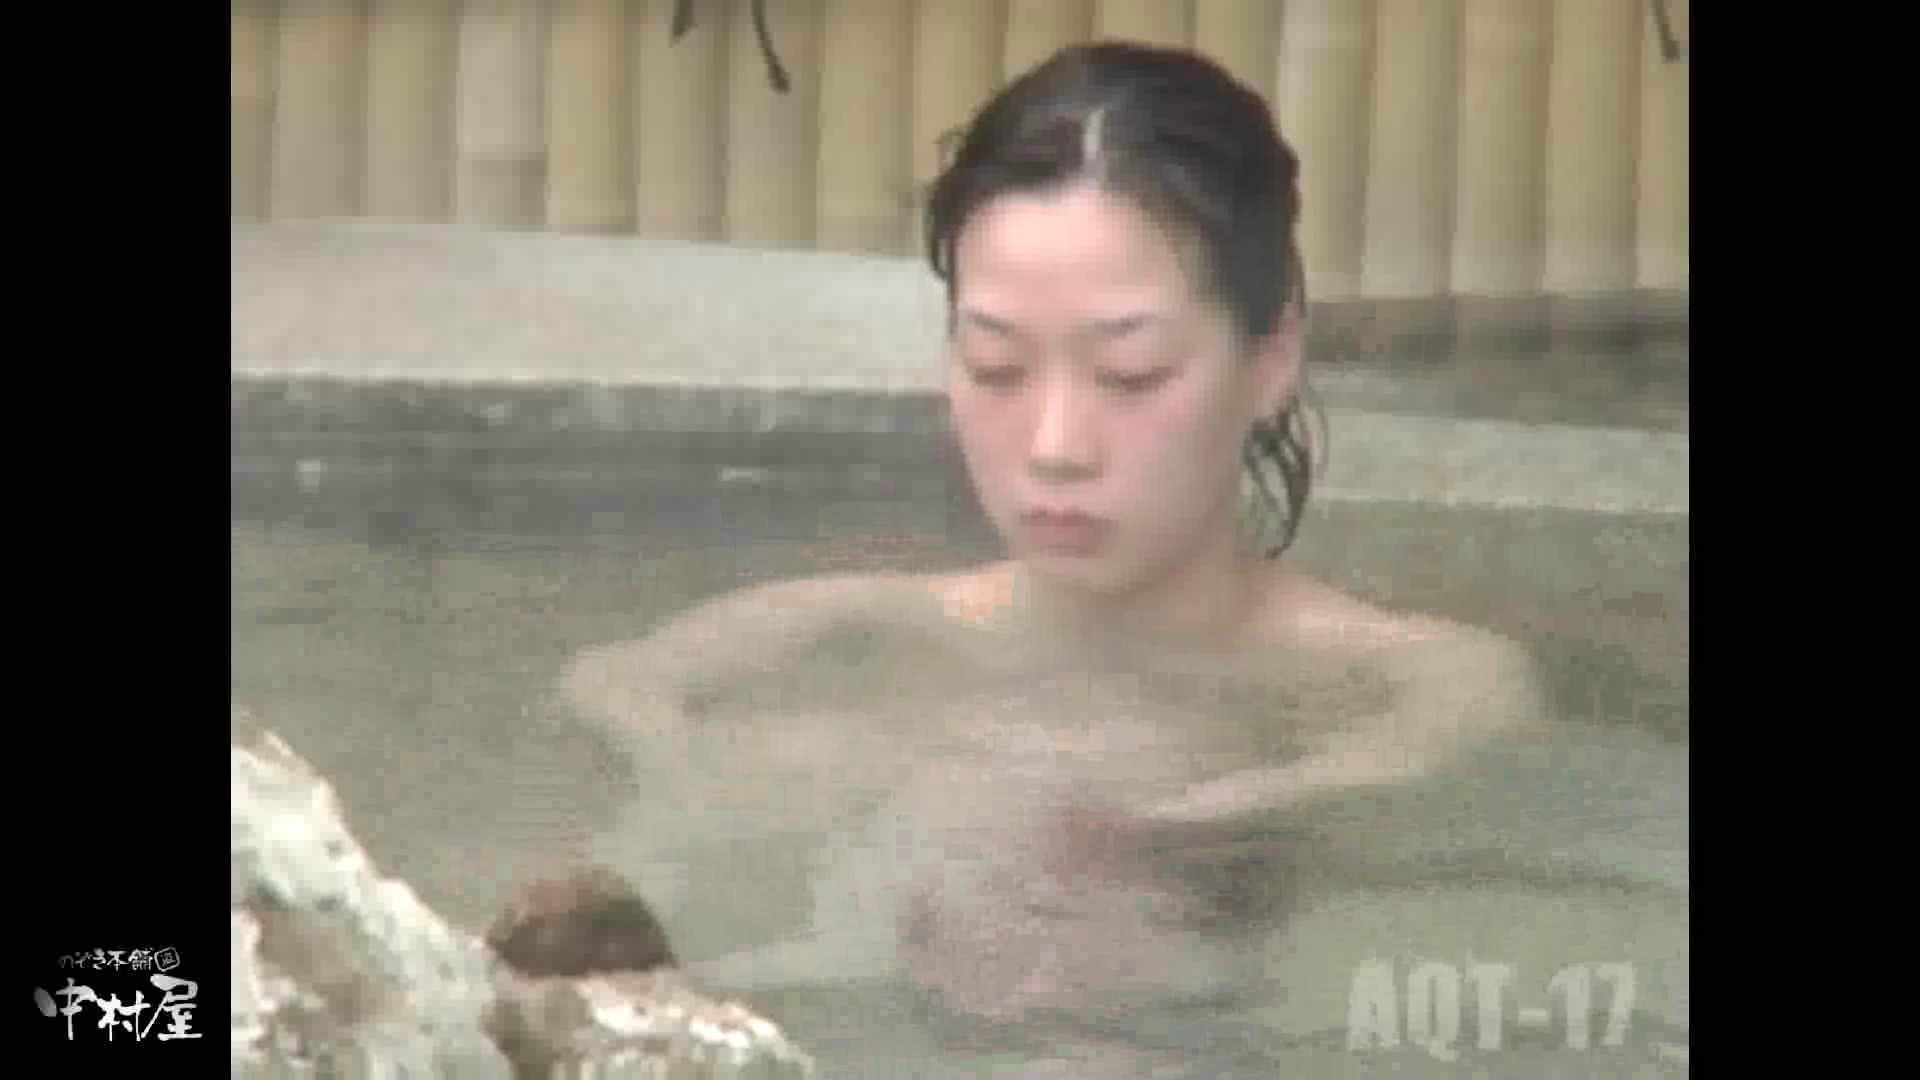 Aquaな露天風呂Vol.881潜入盗撮露天風呂十七判湯 其の一 OL  29連発 14